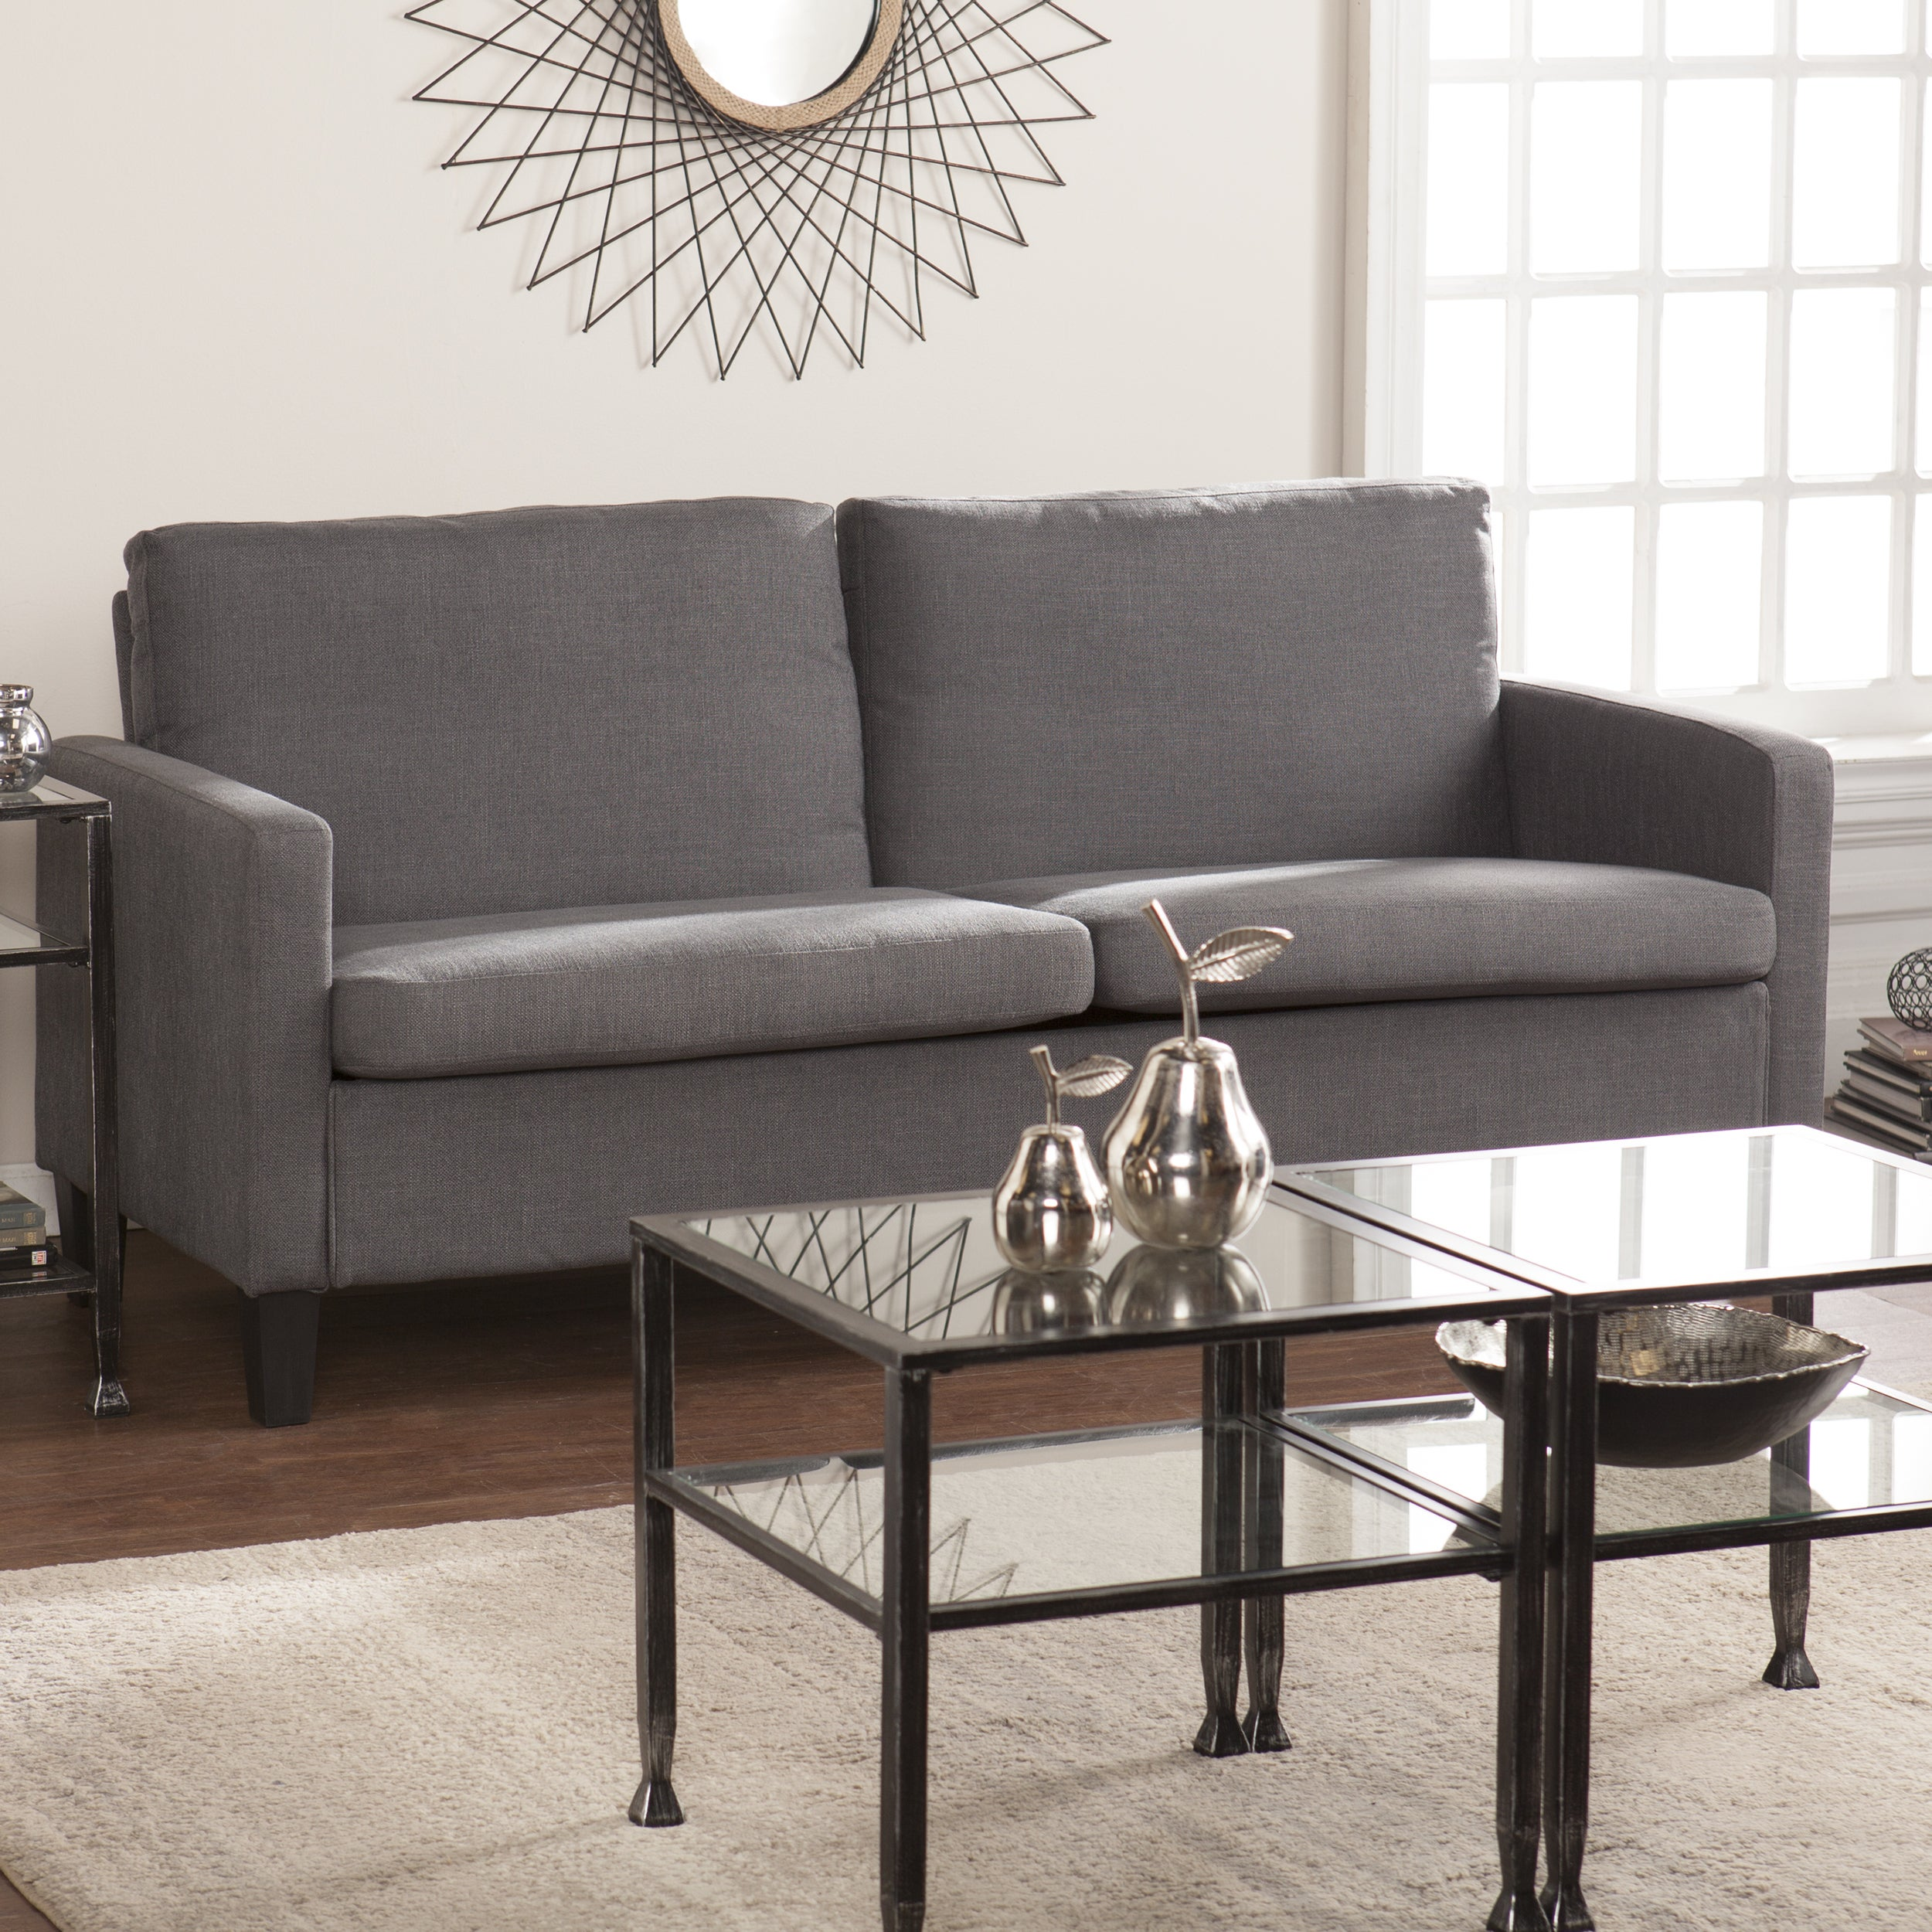 Harper Blvd Alvarez Small Space Sofa - Gray (OS3989PU), G...